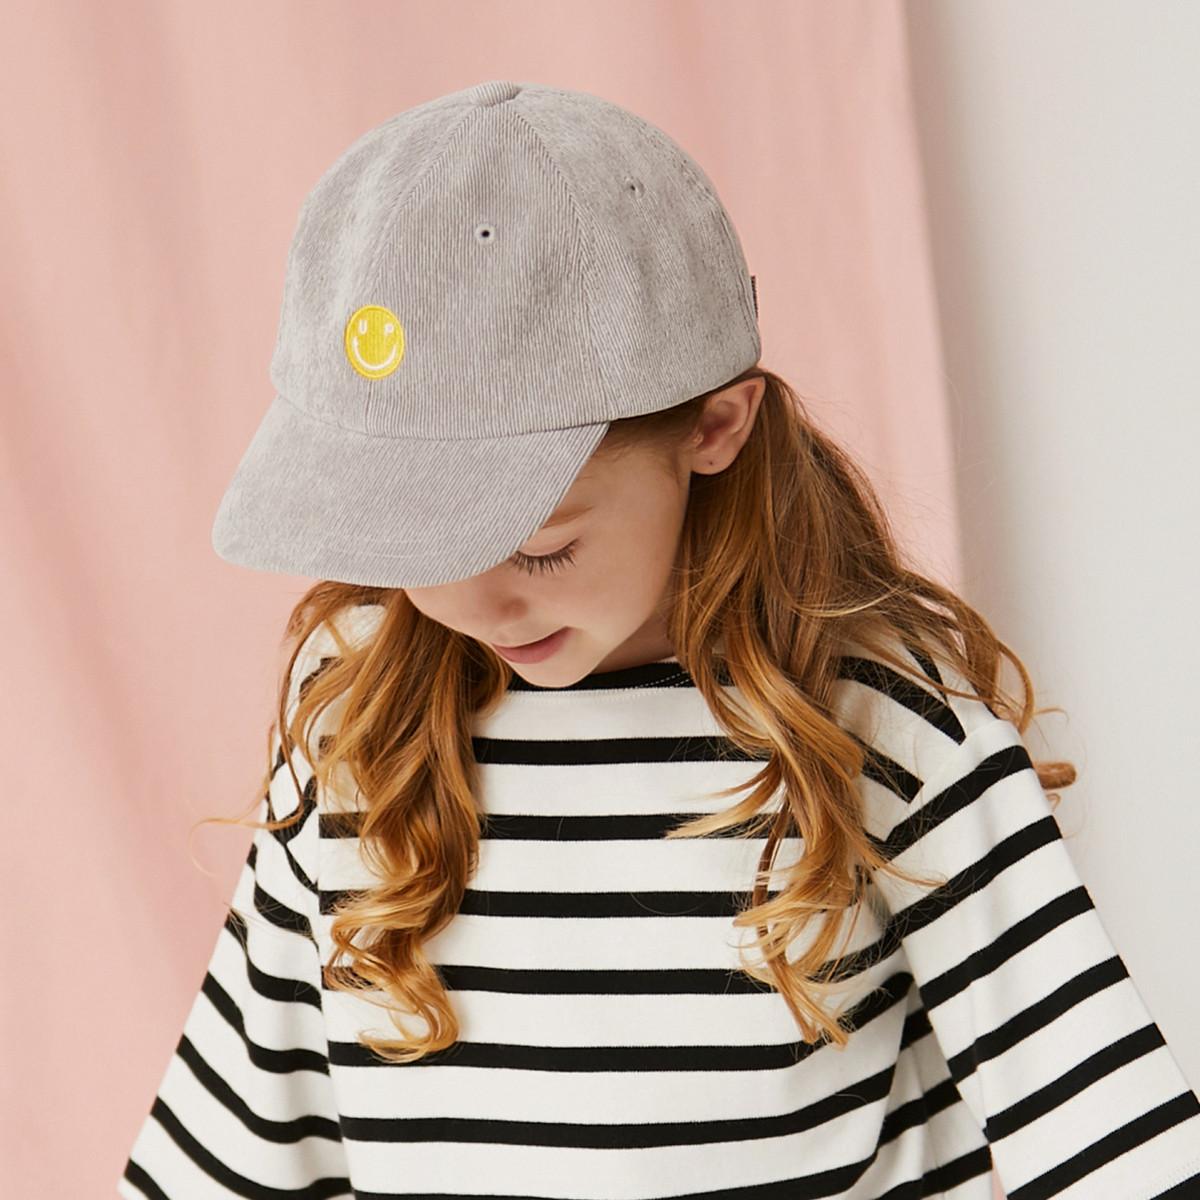 Mini Balabala迷你巴拉巴拉儿童帽男女童棒球帽鸭舌帽2019秋季新款遮阳帽M16031922050122